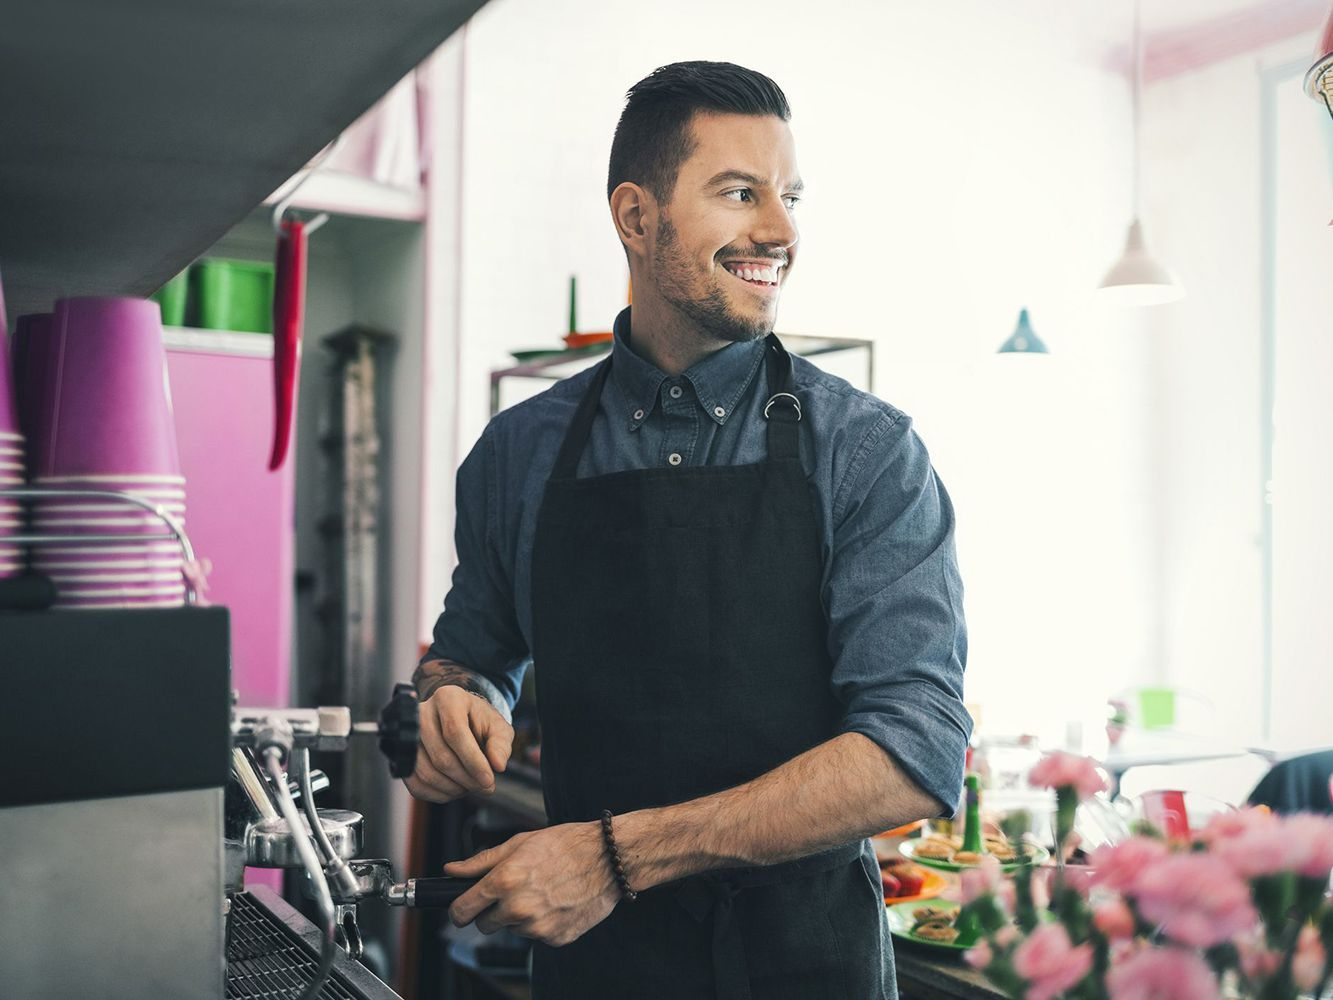 30 starbucks barista job description for resume with